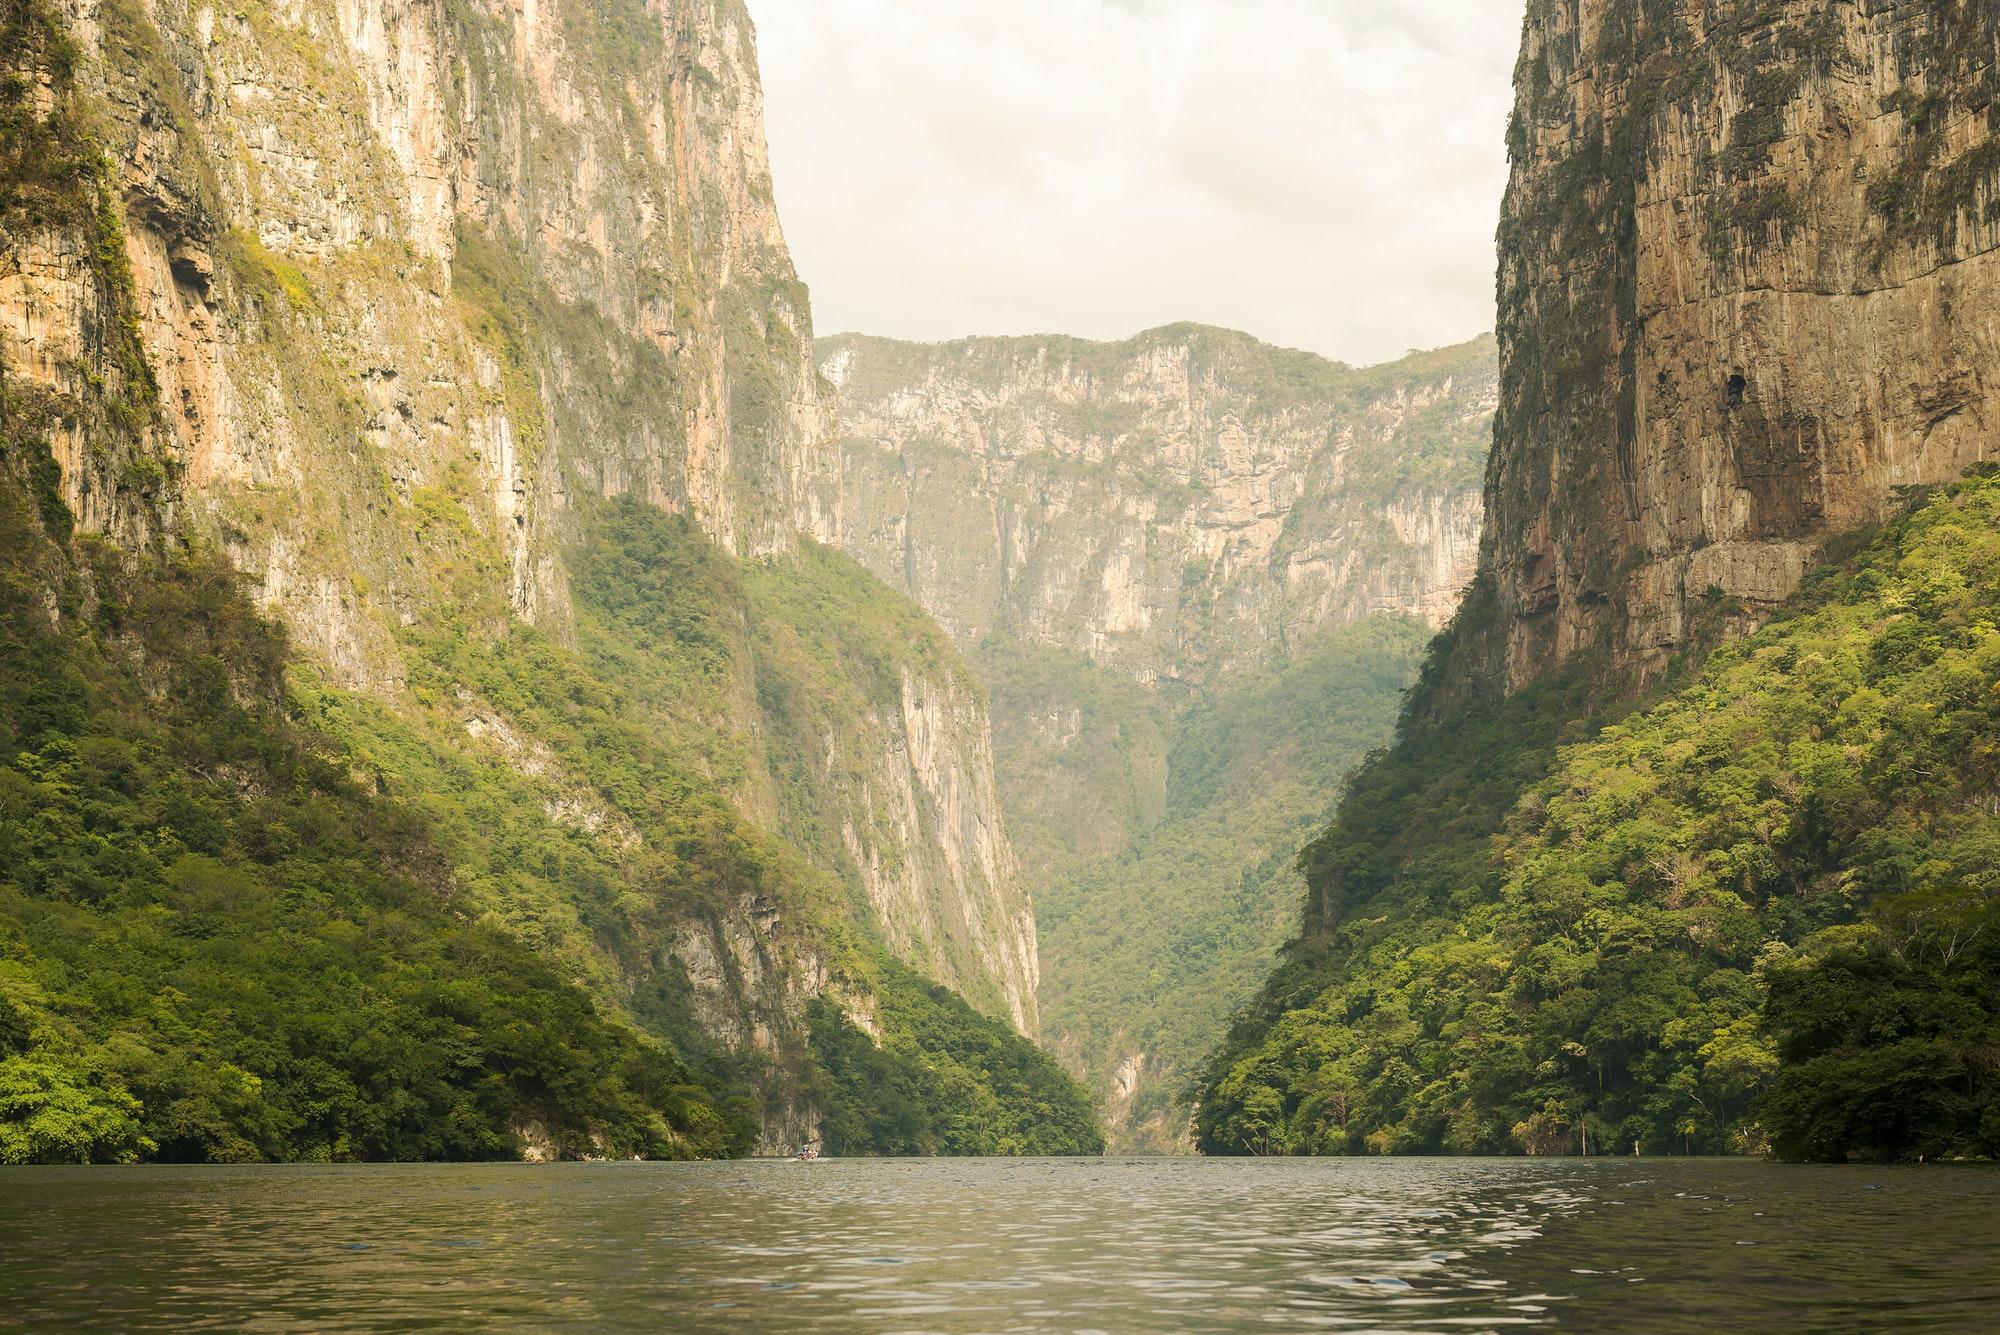 Sumidero Canyon Chiapas